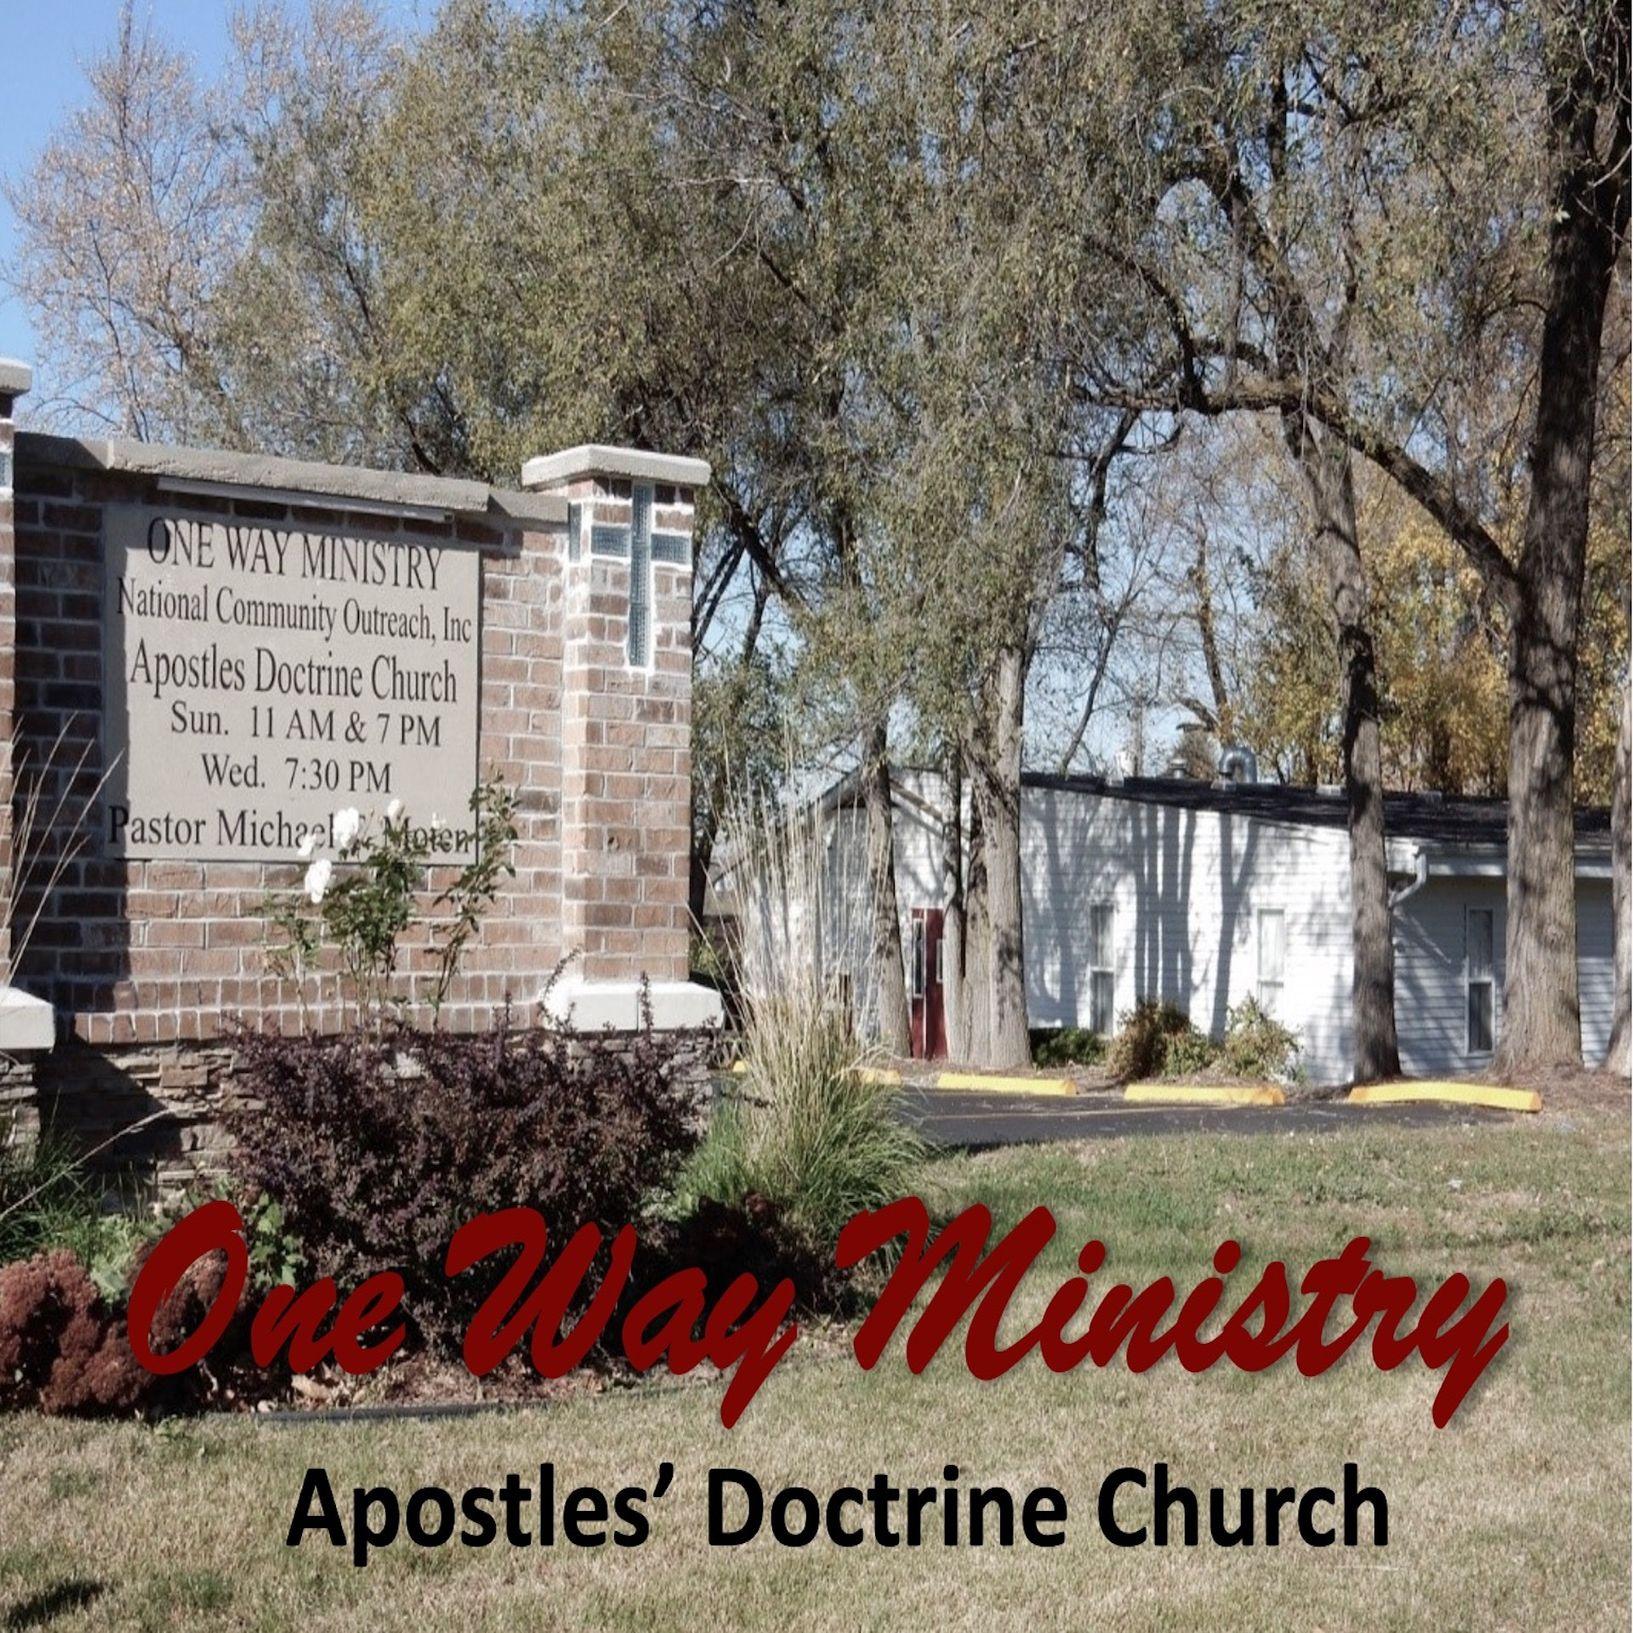 One Way Ministry Apostles' Doctrine Church